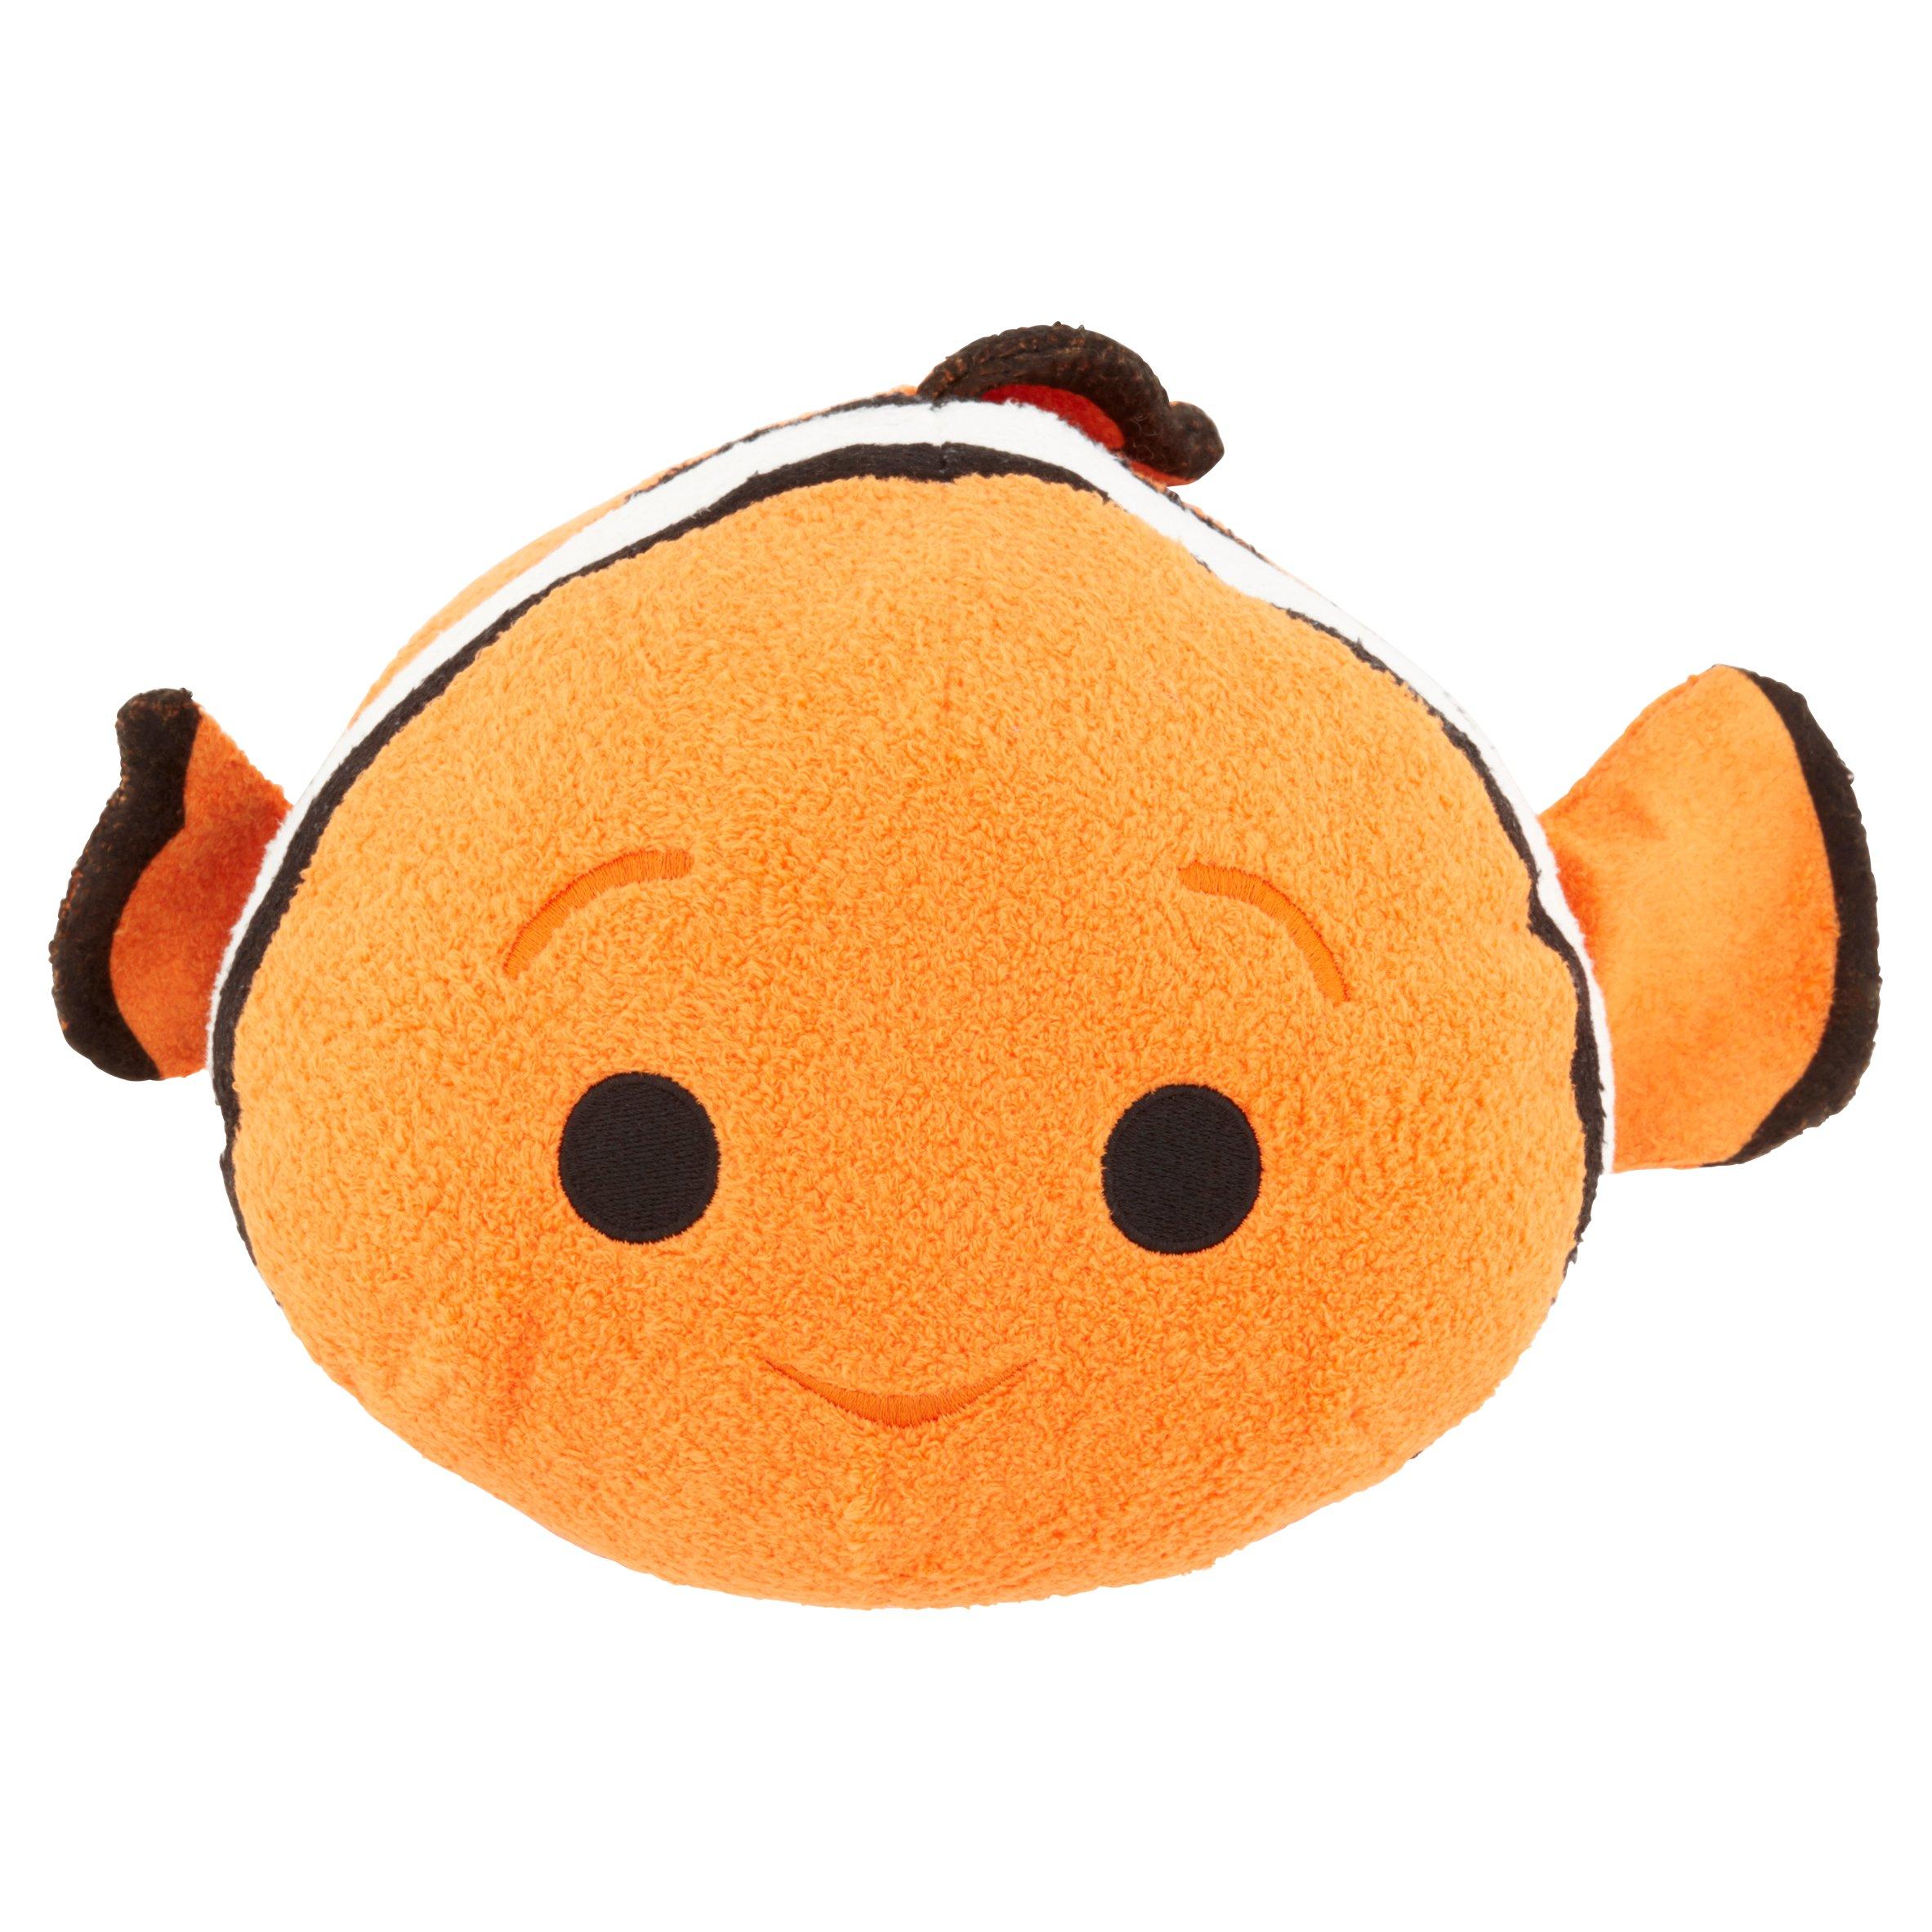 "Disney-Pixar Nemo Tsum Tsum 12"" Plush"